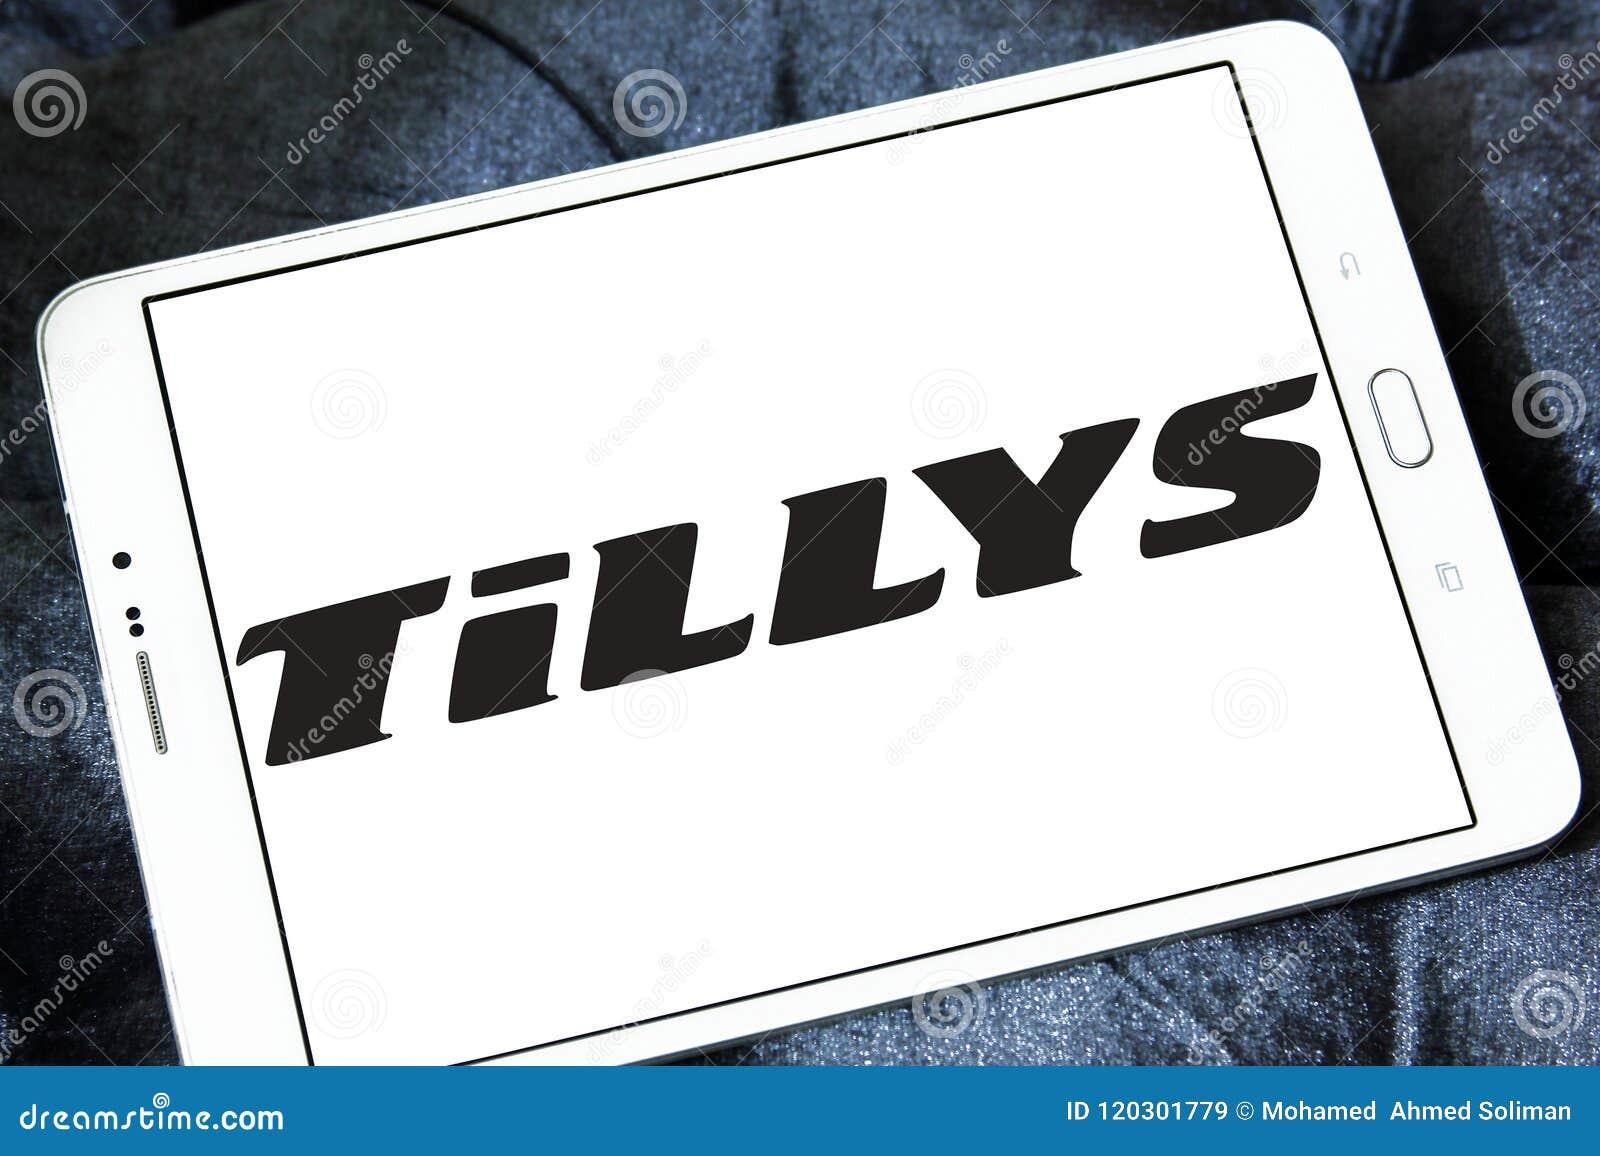 Tillys fashion brand logo